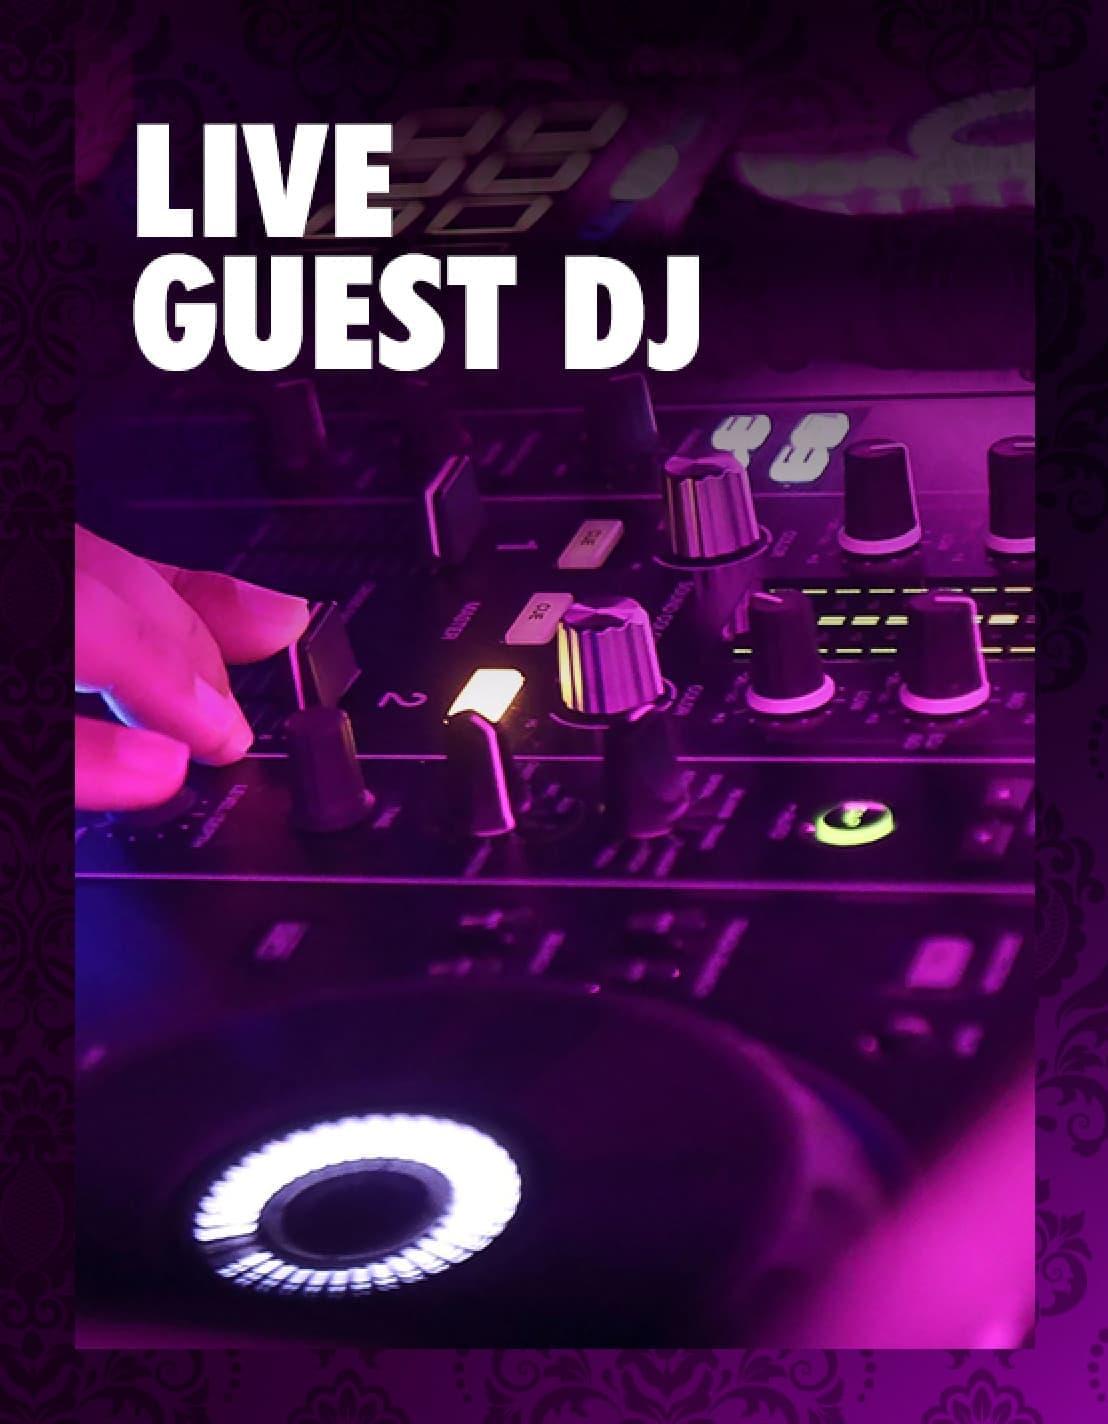 LIVE GUEST DJ